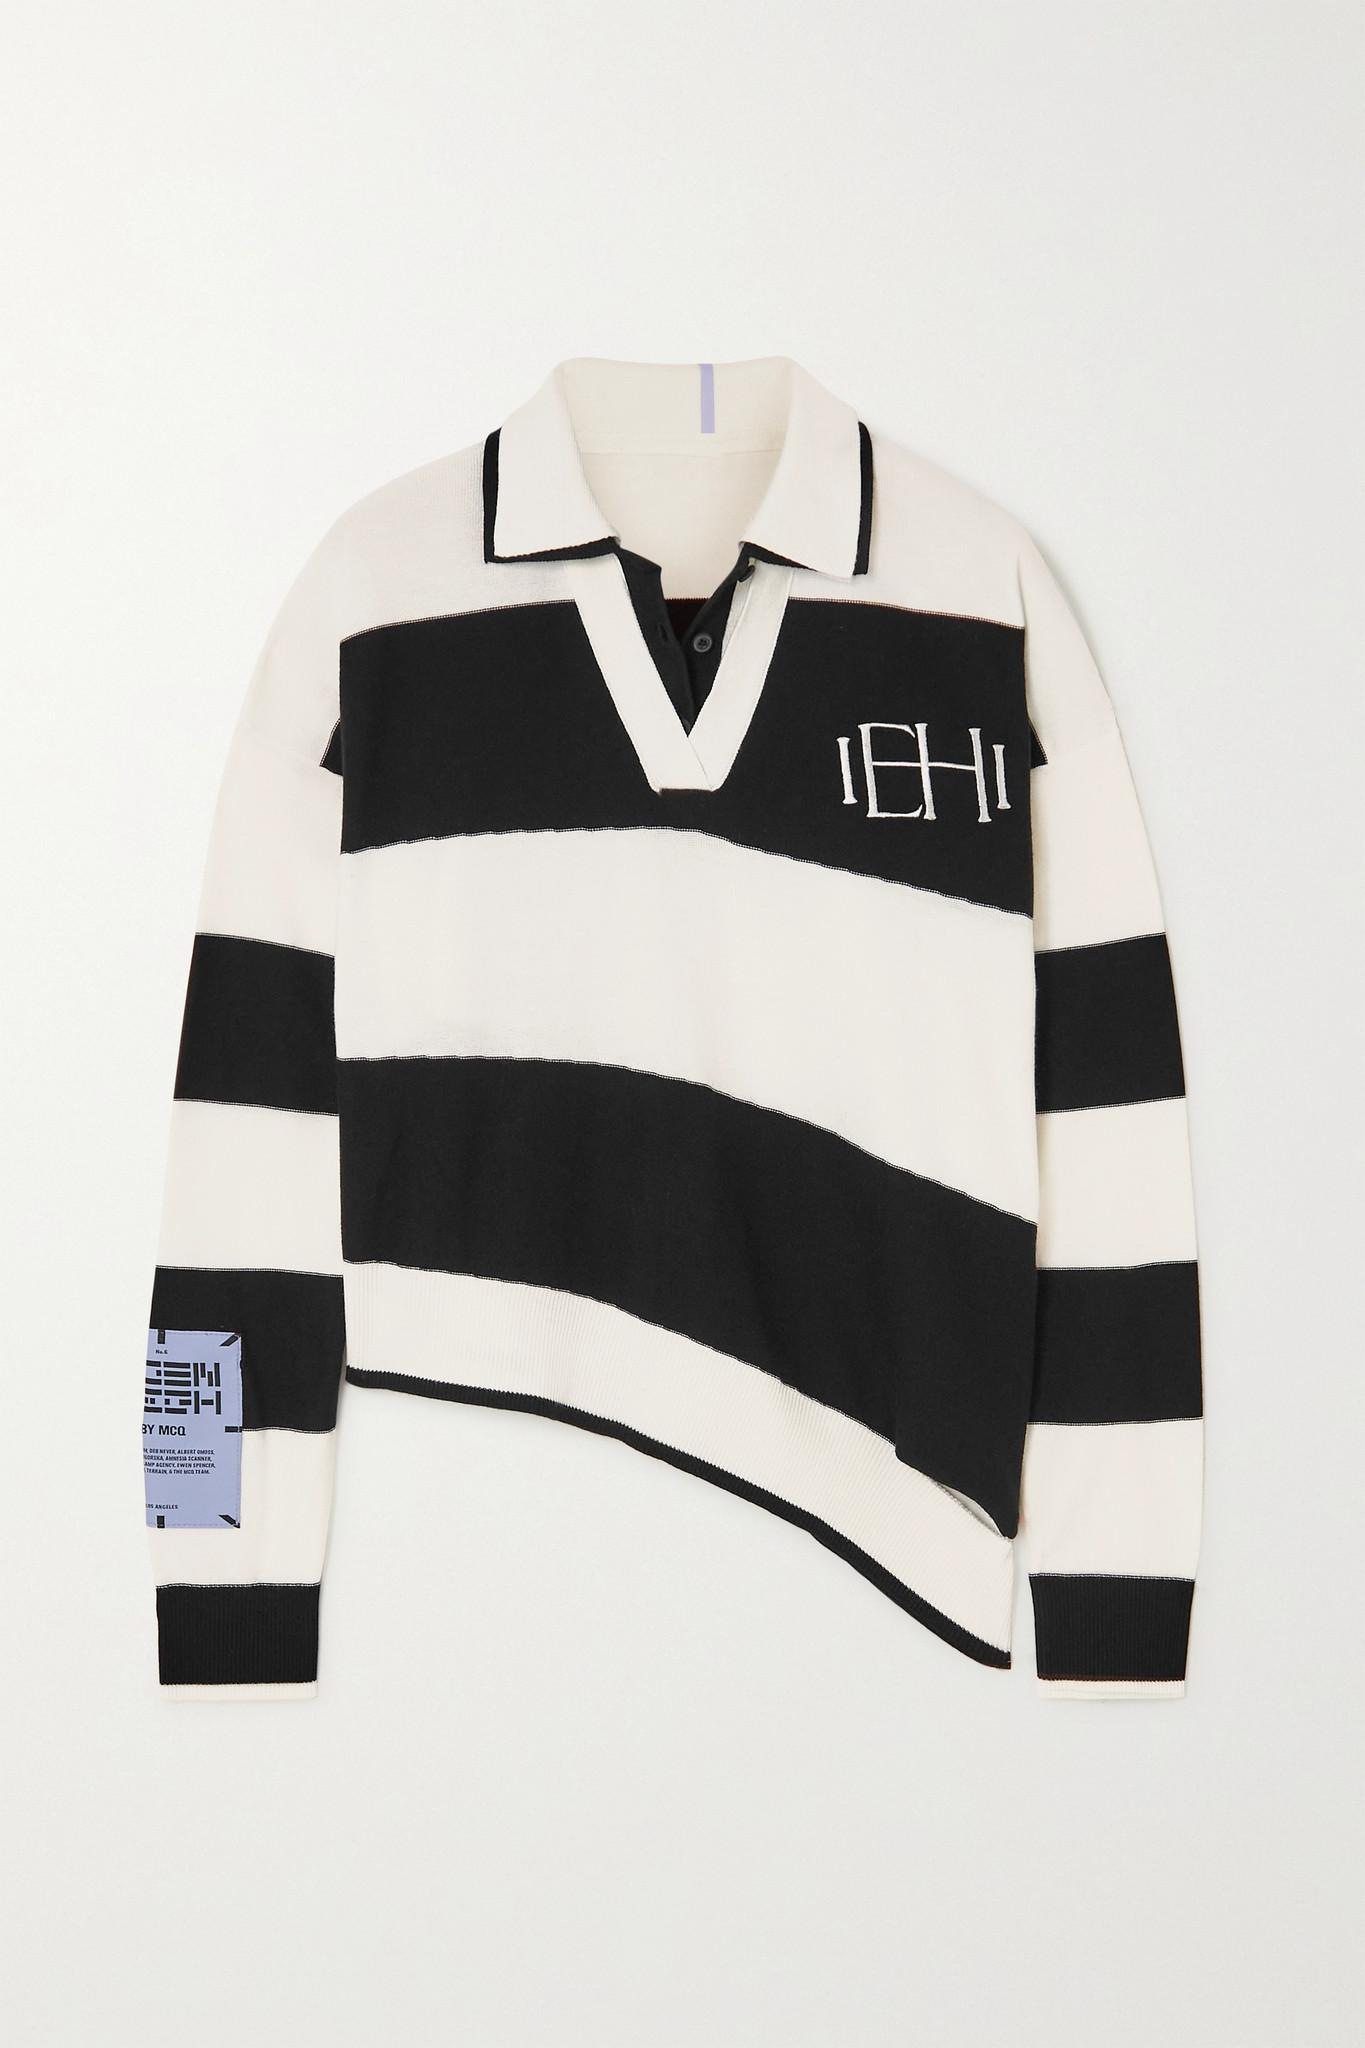 MCQ ALEXANDER MCQUEEN - Eden High 不对称贴花条纹纯棉 Polo 衫 - 白色 - small